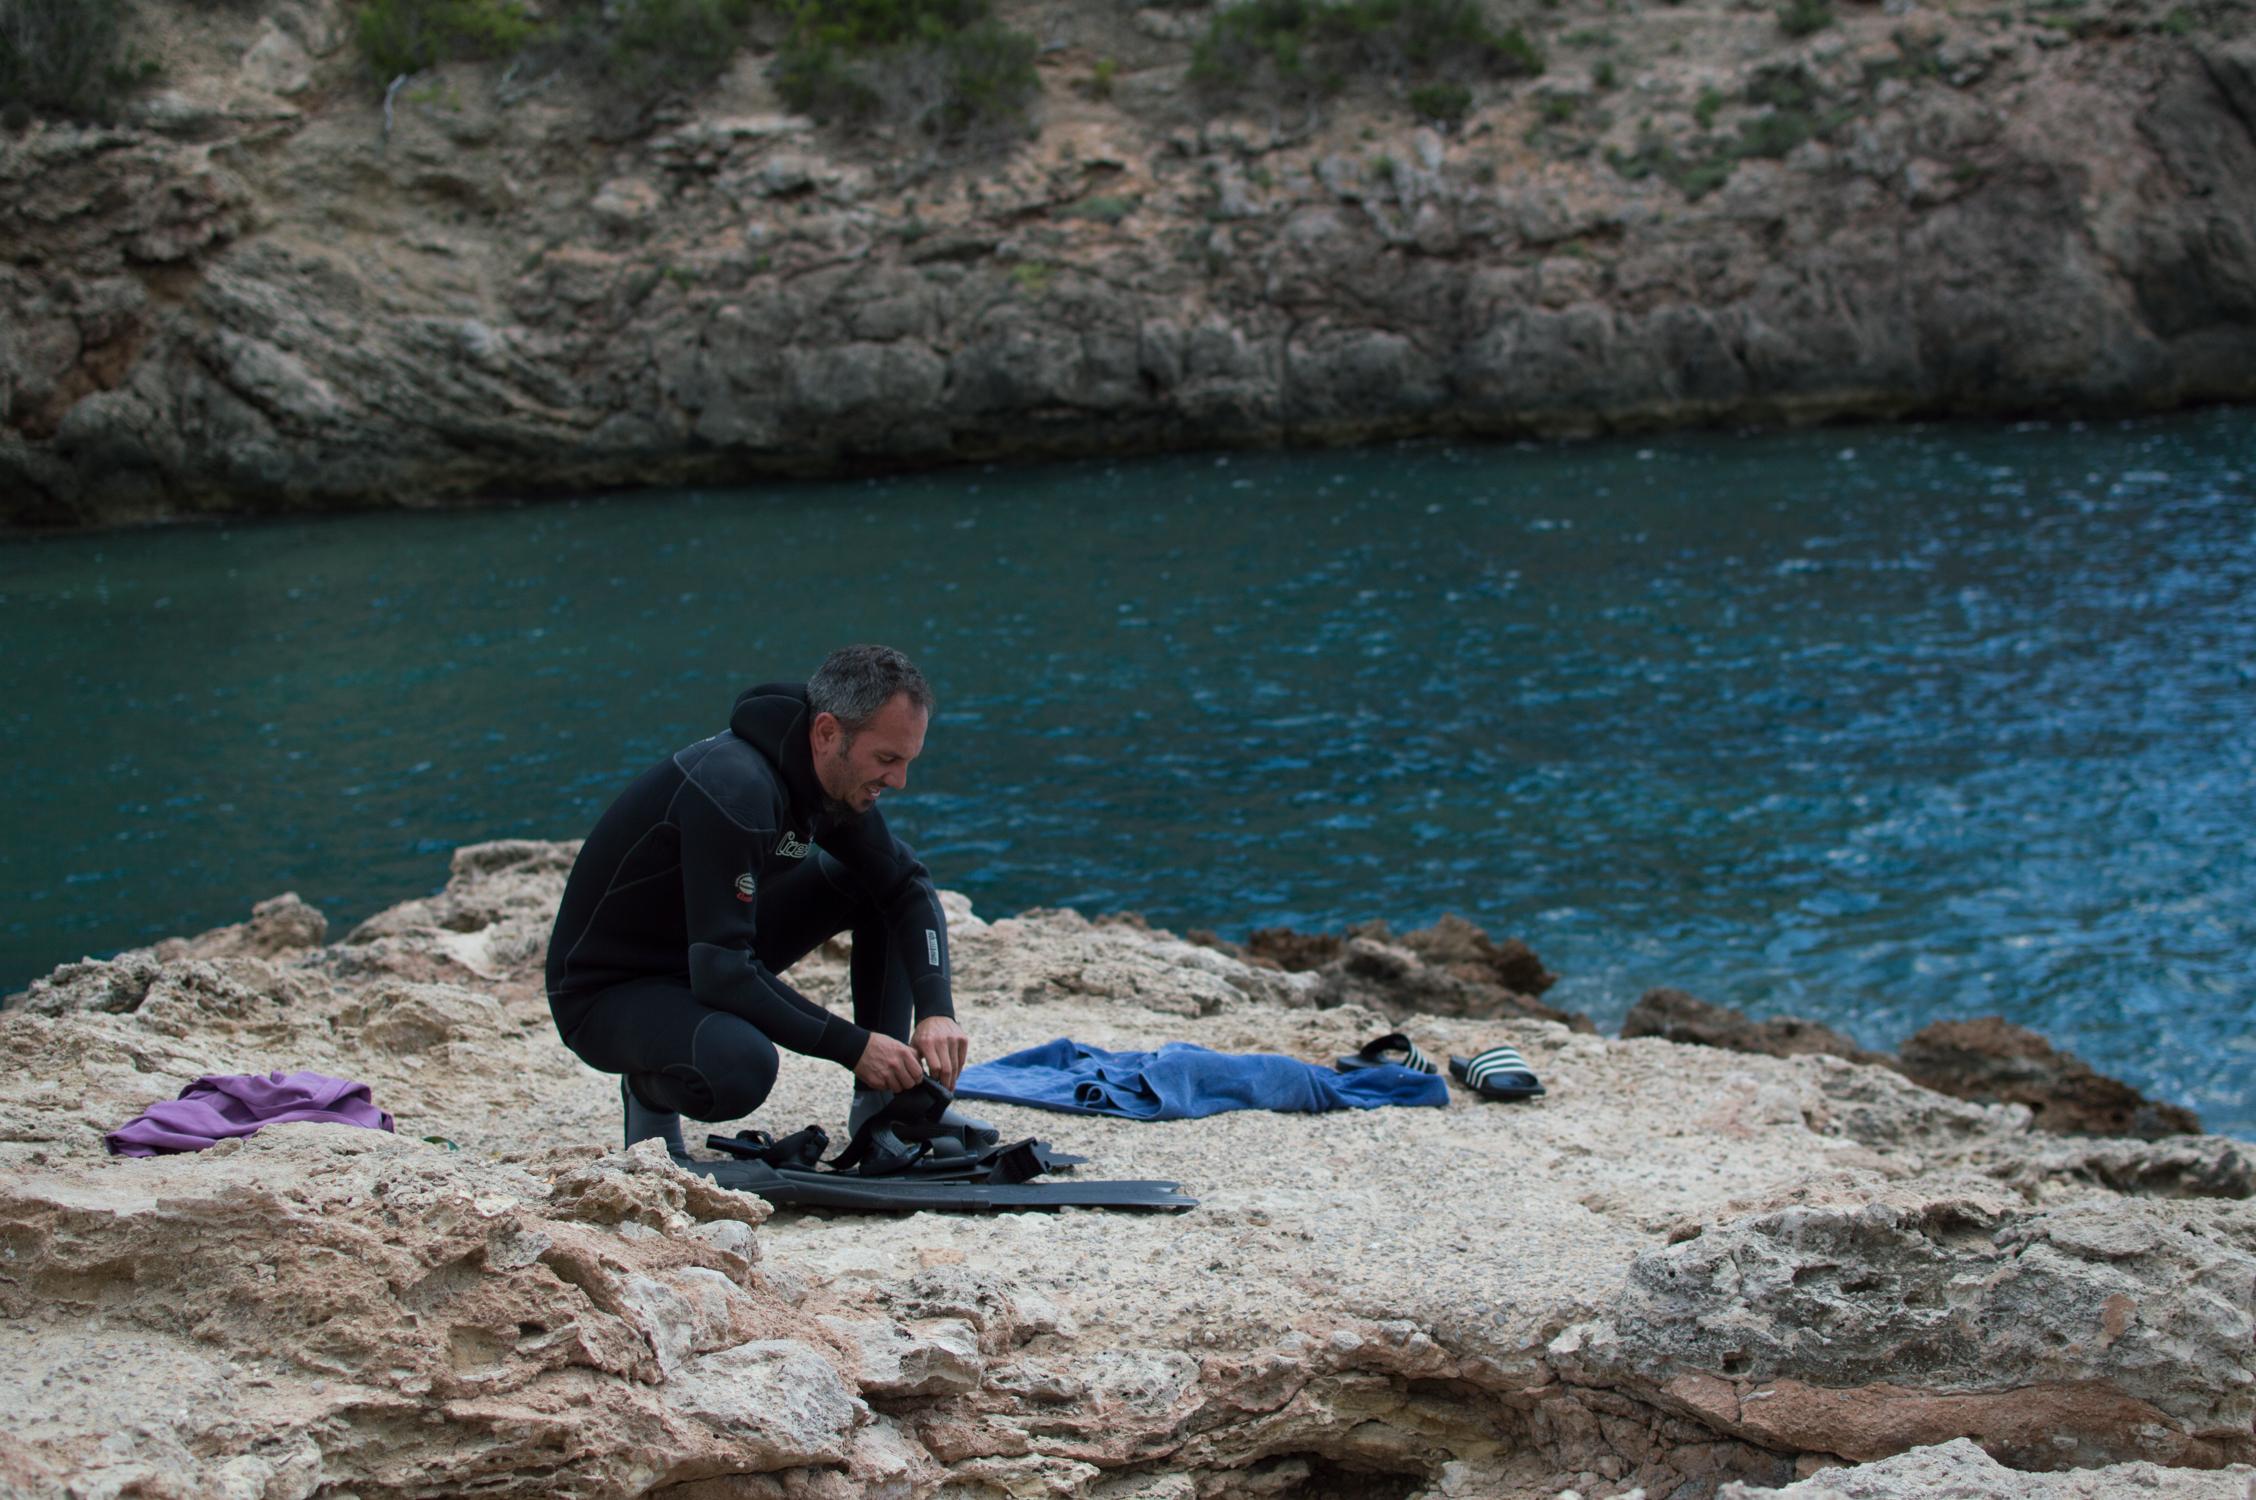 freediving-5616